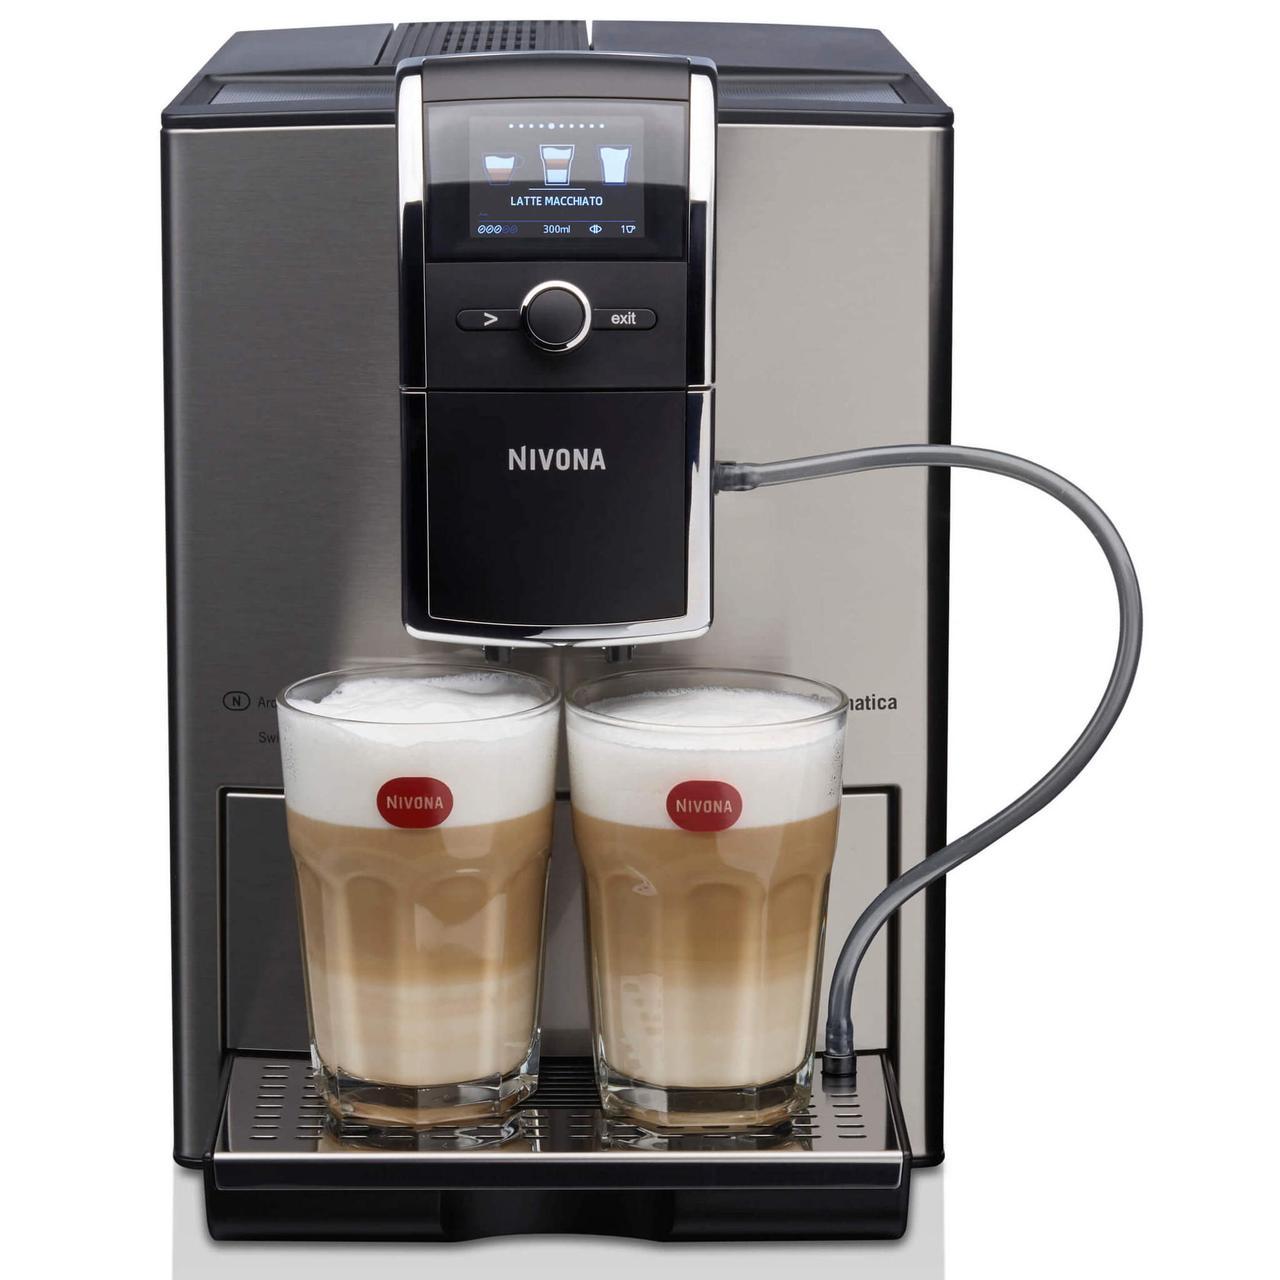 Кофемашина Nivona CafeRomatica NICR 859 1455 Вт